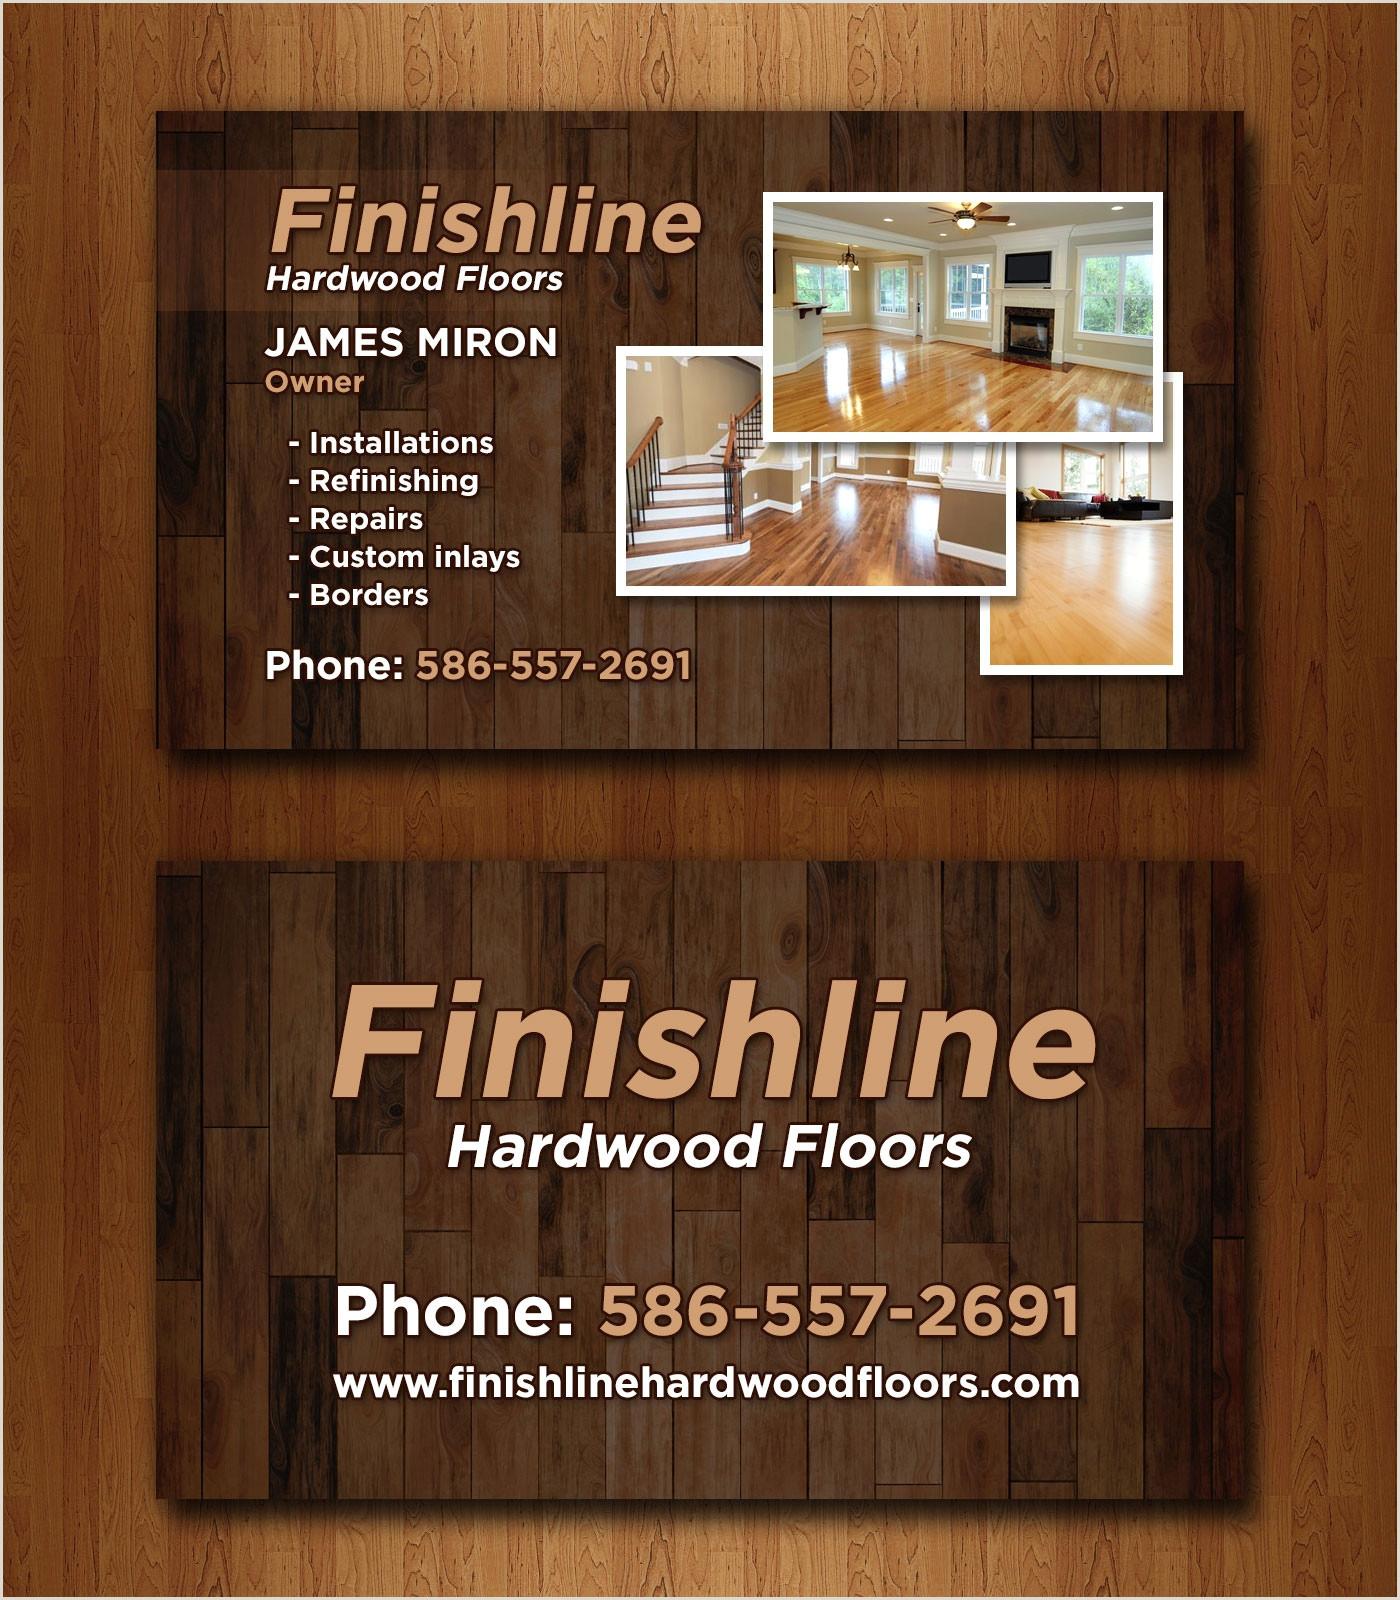 Free Business Cards Template Word 14 Popular Hardwood Flooring Business Card Template